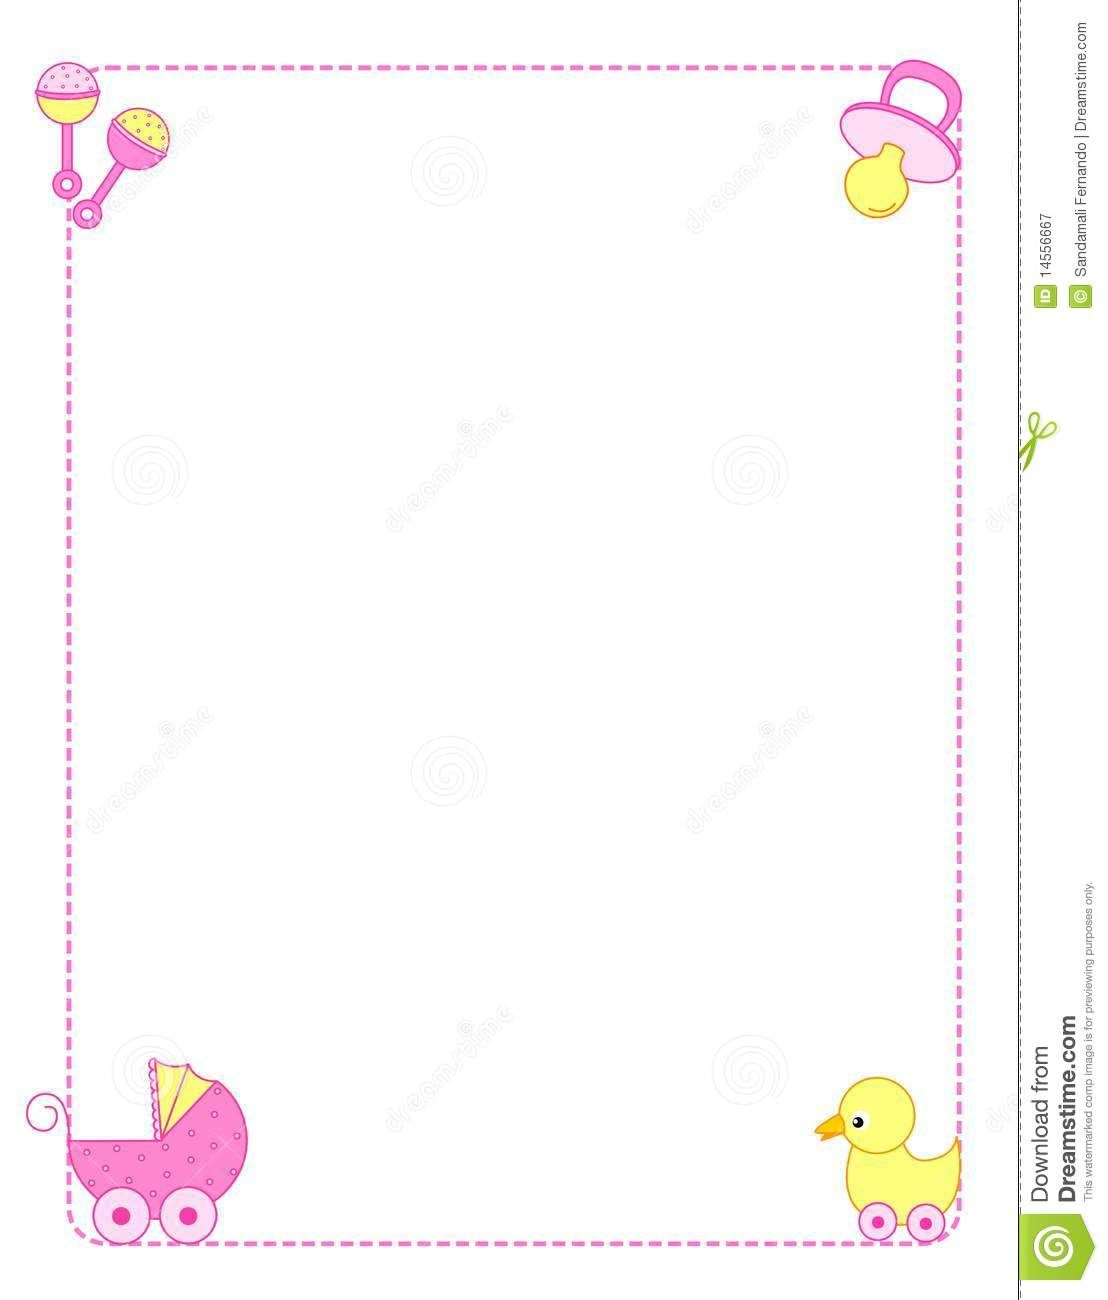 baby girl border clip art free boarder pinterest clip art free